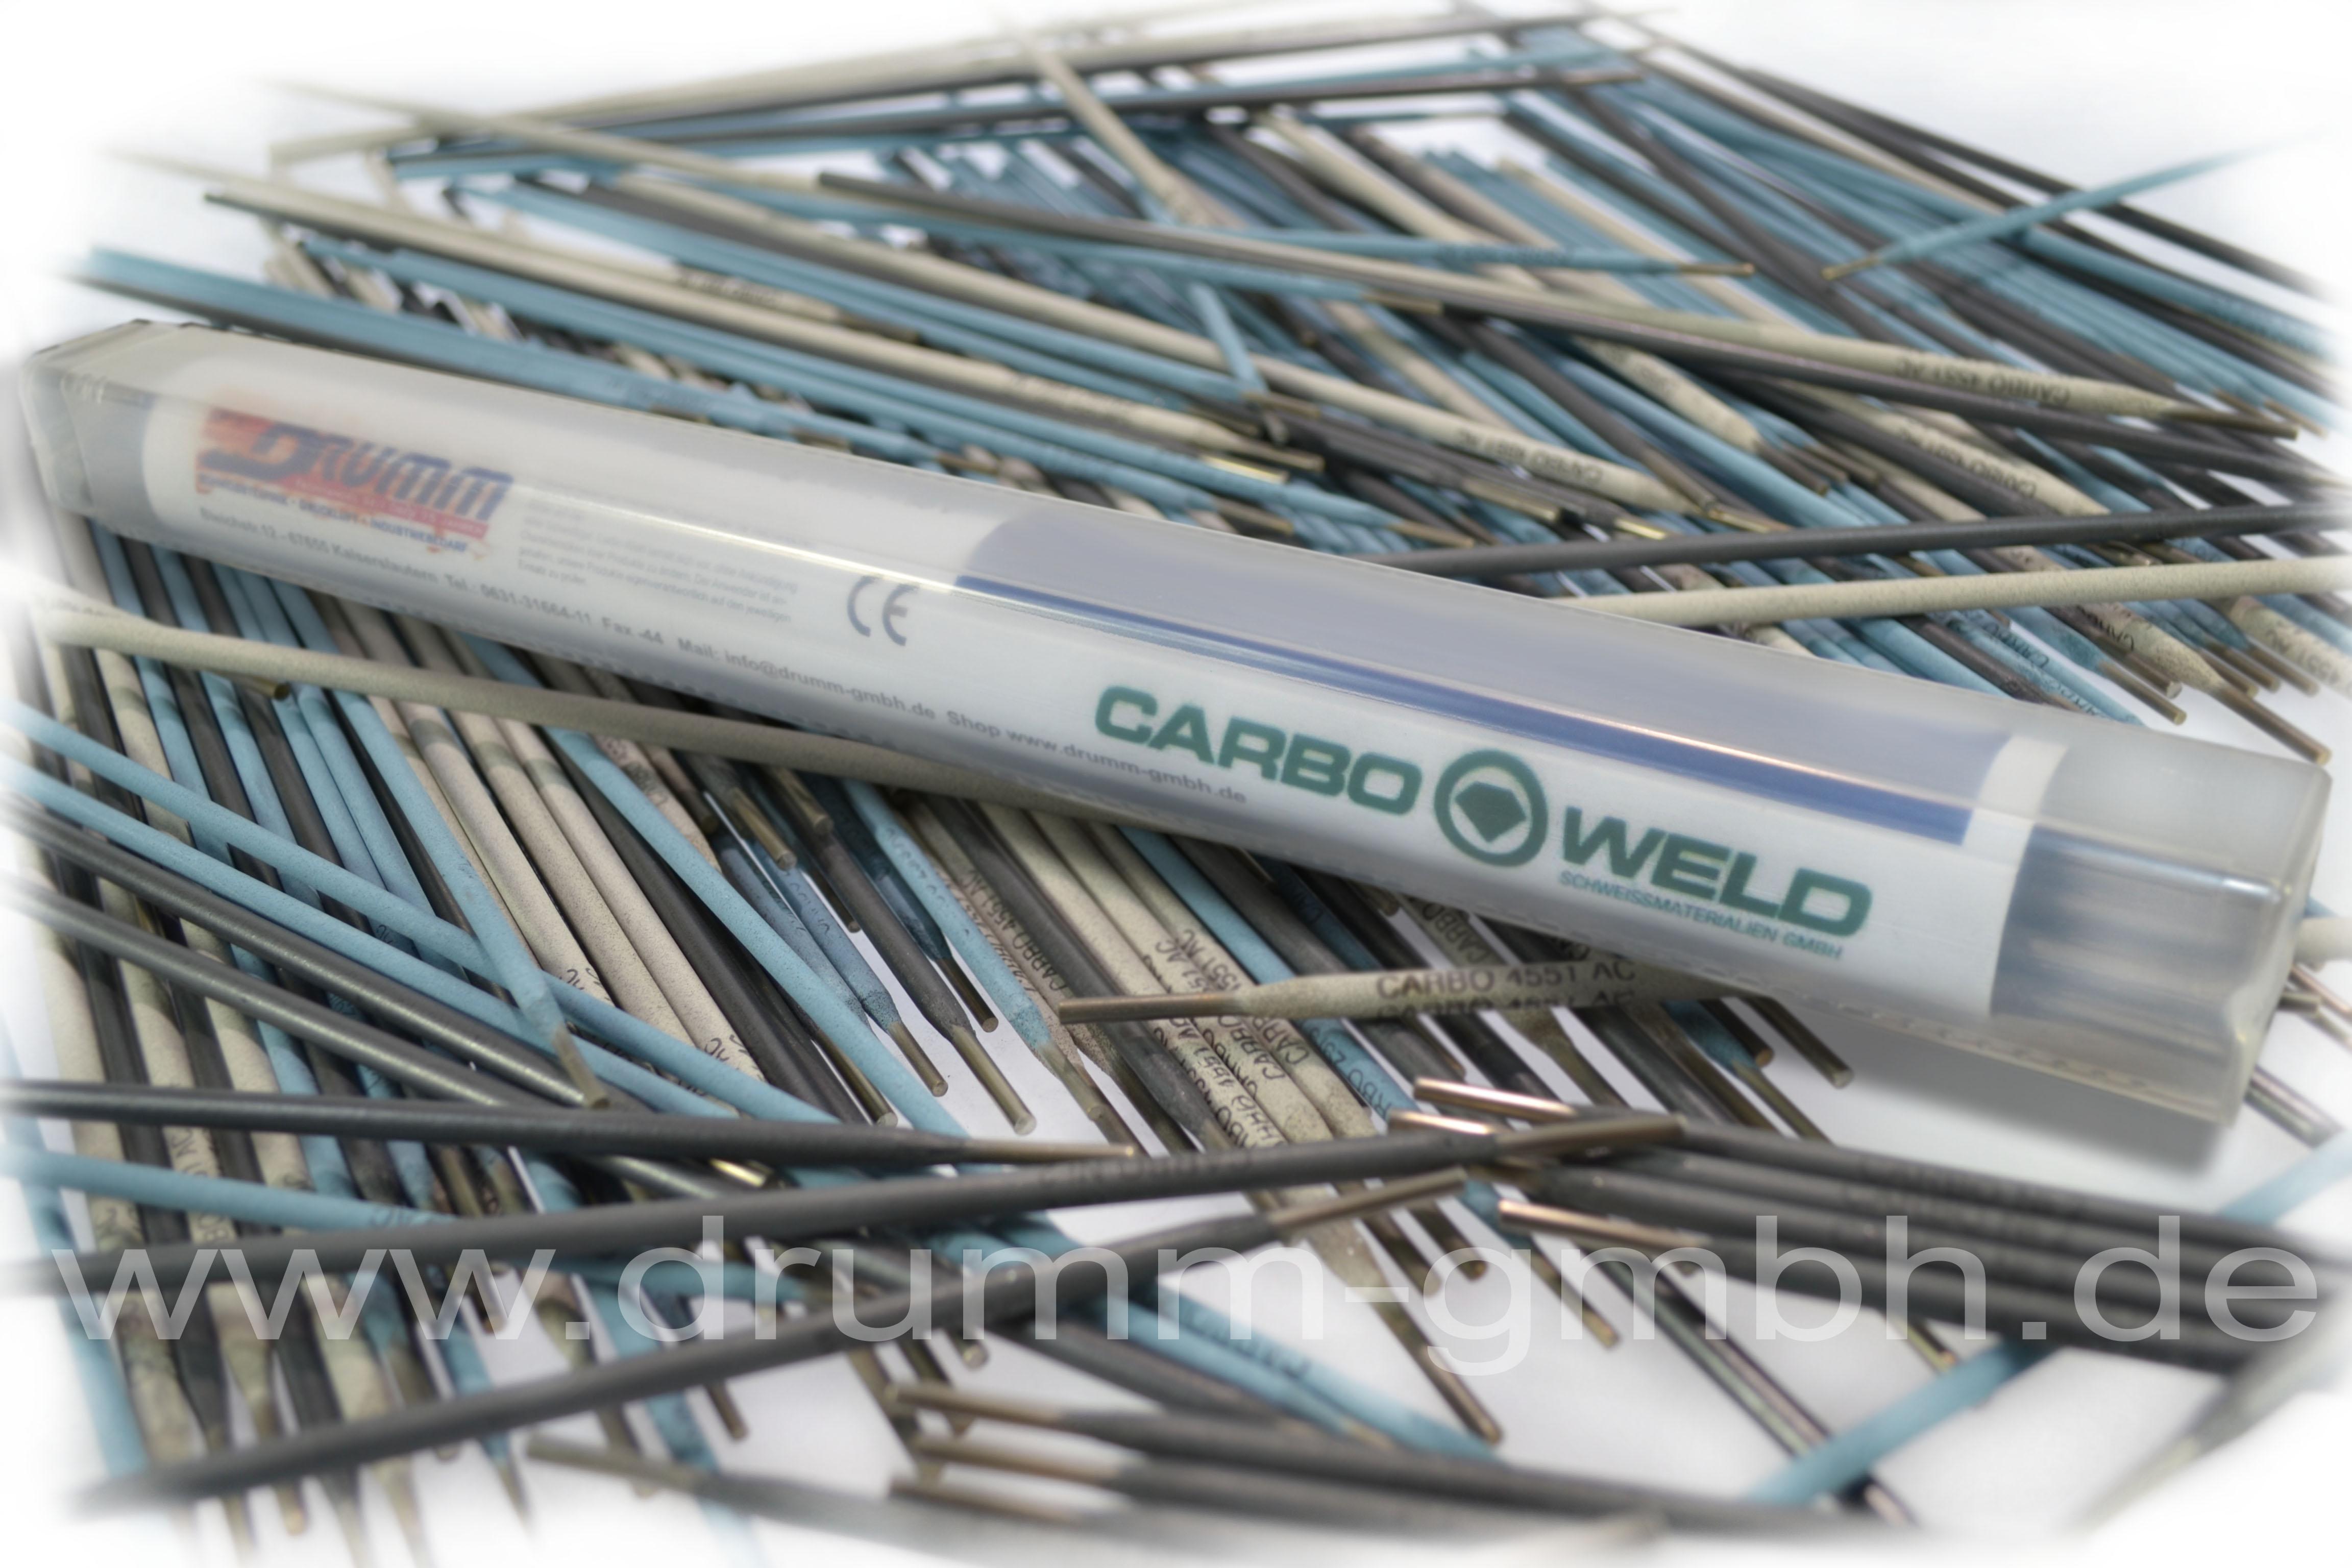 Stabelektroden Carbo Weld CARBO NiFe 31, Maße 2,5 x 300 mm, 10 Stück